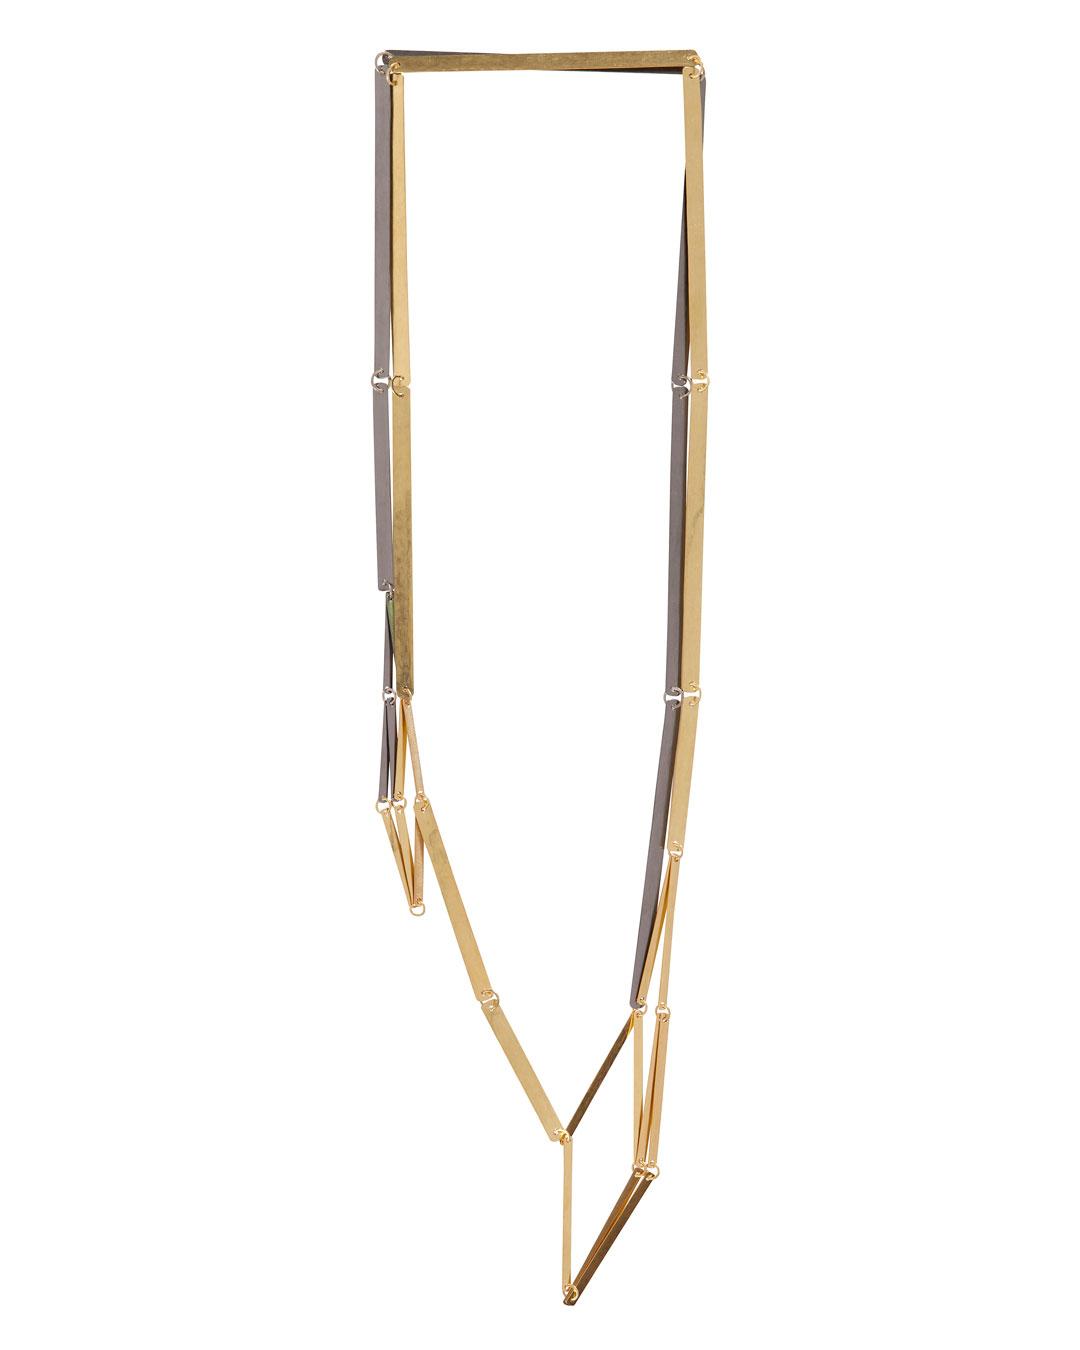 Annelies Planteijdt, Mooie stad – Collier en glaasjes (Beautiful City - Necklace and Glasses), 2017, necklace; gold, tantalum, pigment, 180 x 360 mm, €8875 (image 2/3)